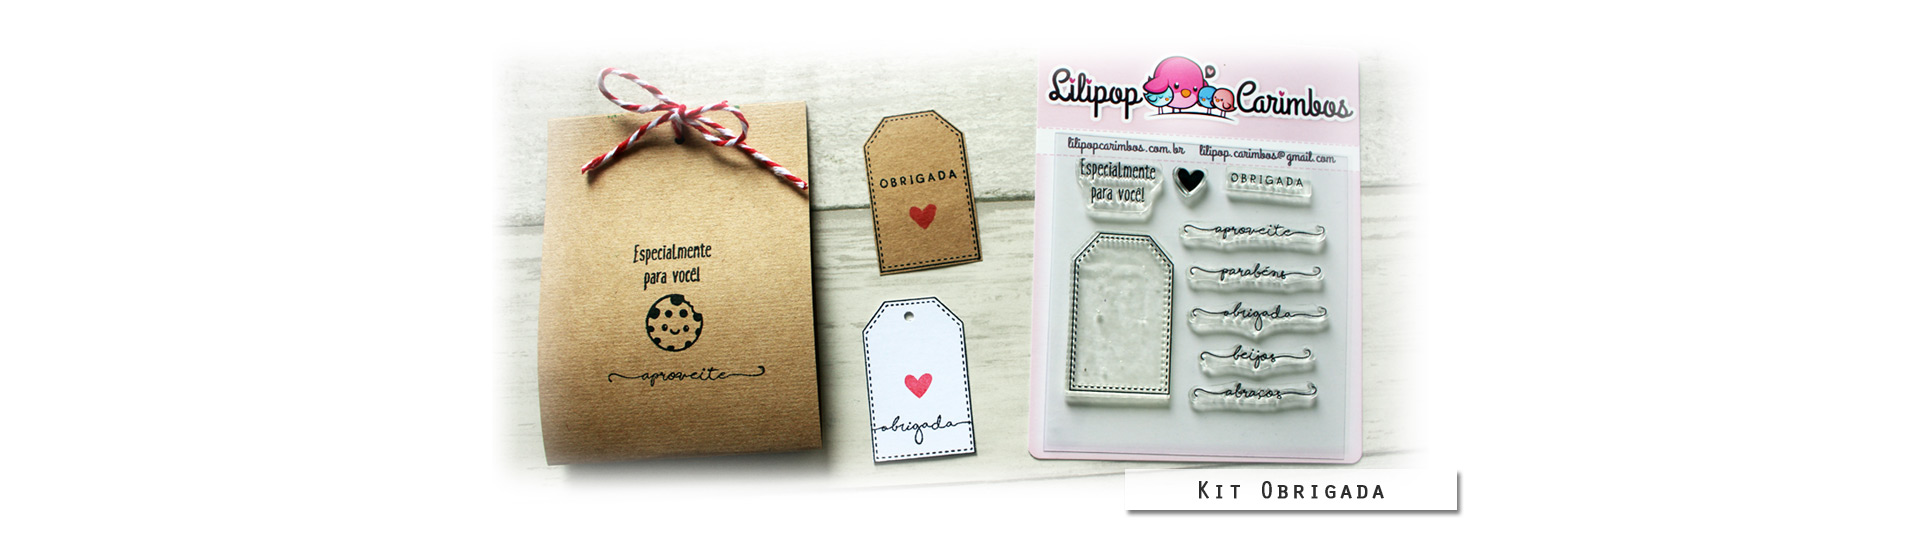 http://www.lilipopcarimbos.com.br/carimbos/sentimentos-emocoes/kit-de-carimbos-obrigada